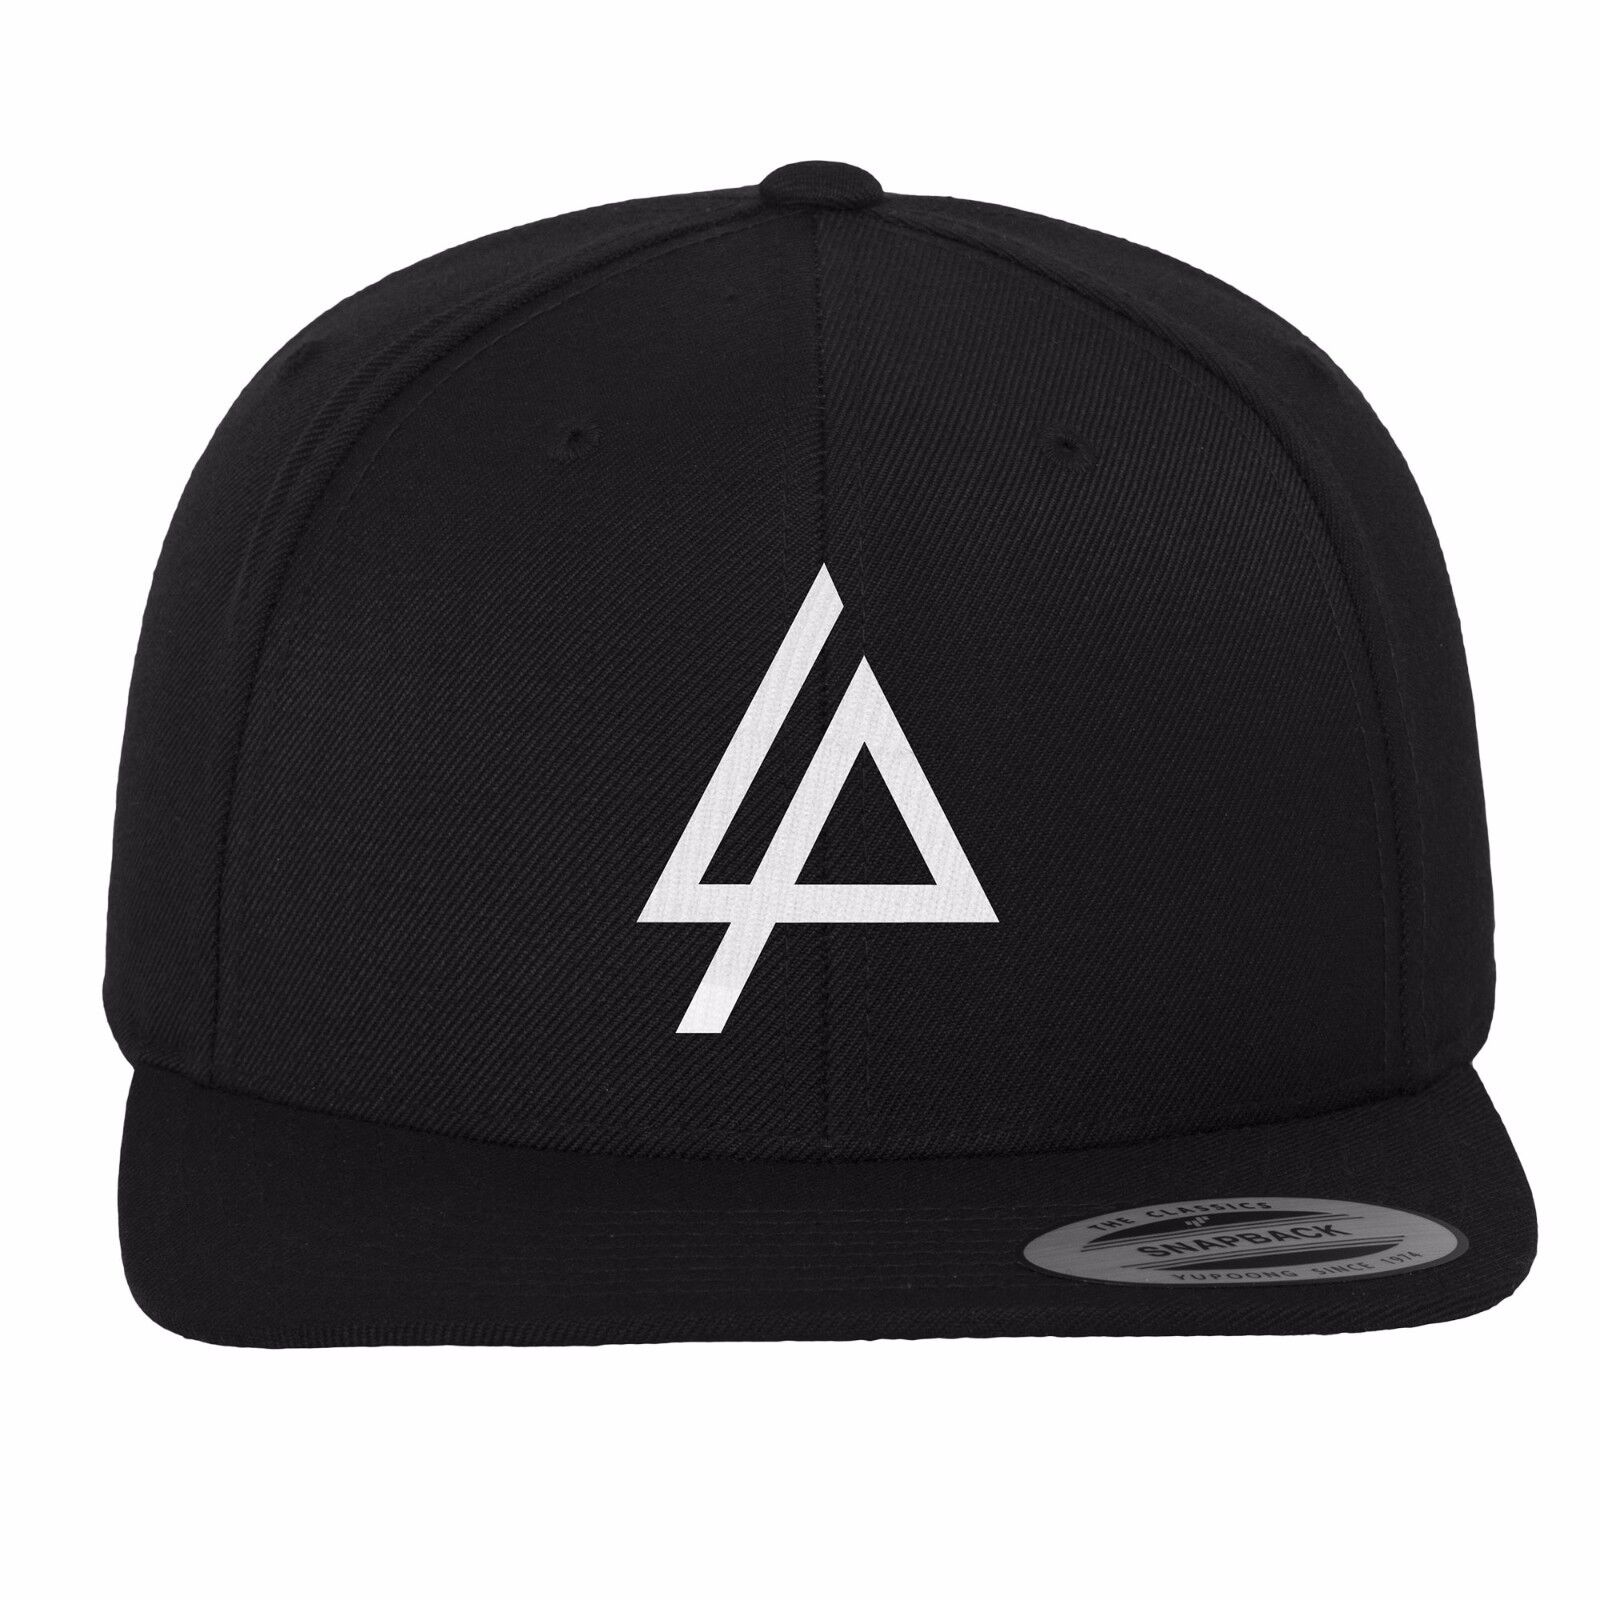 Merchcode Linkin Park Logo Snapback Cap black 6 Panel Yupoong ...